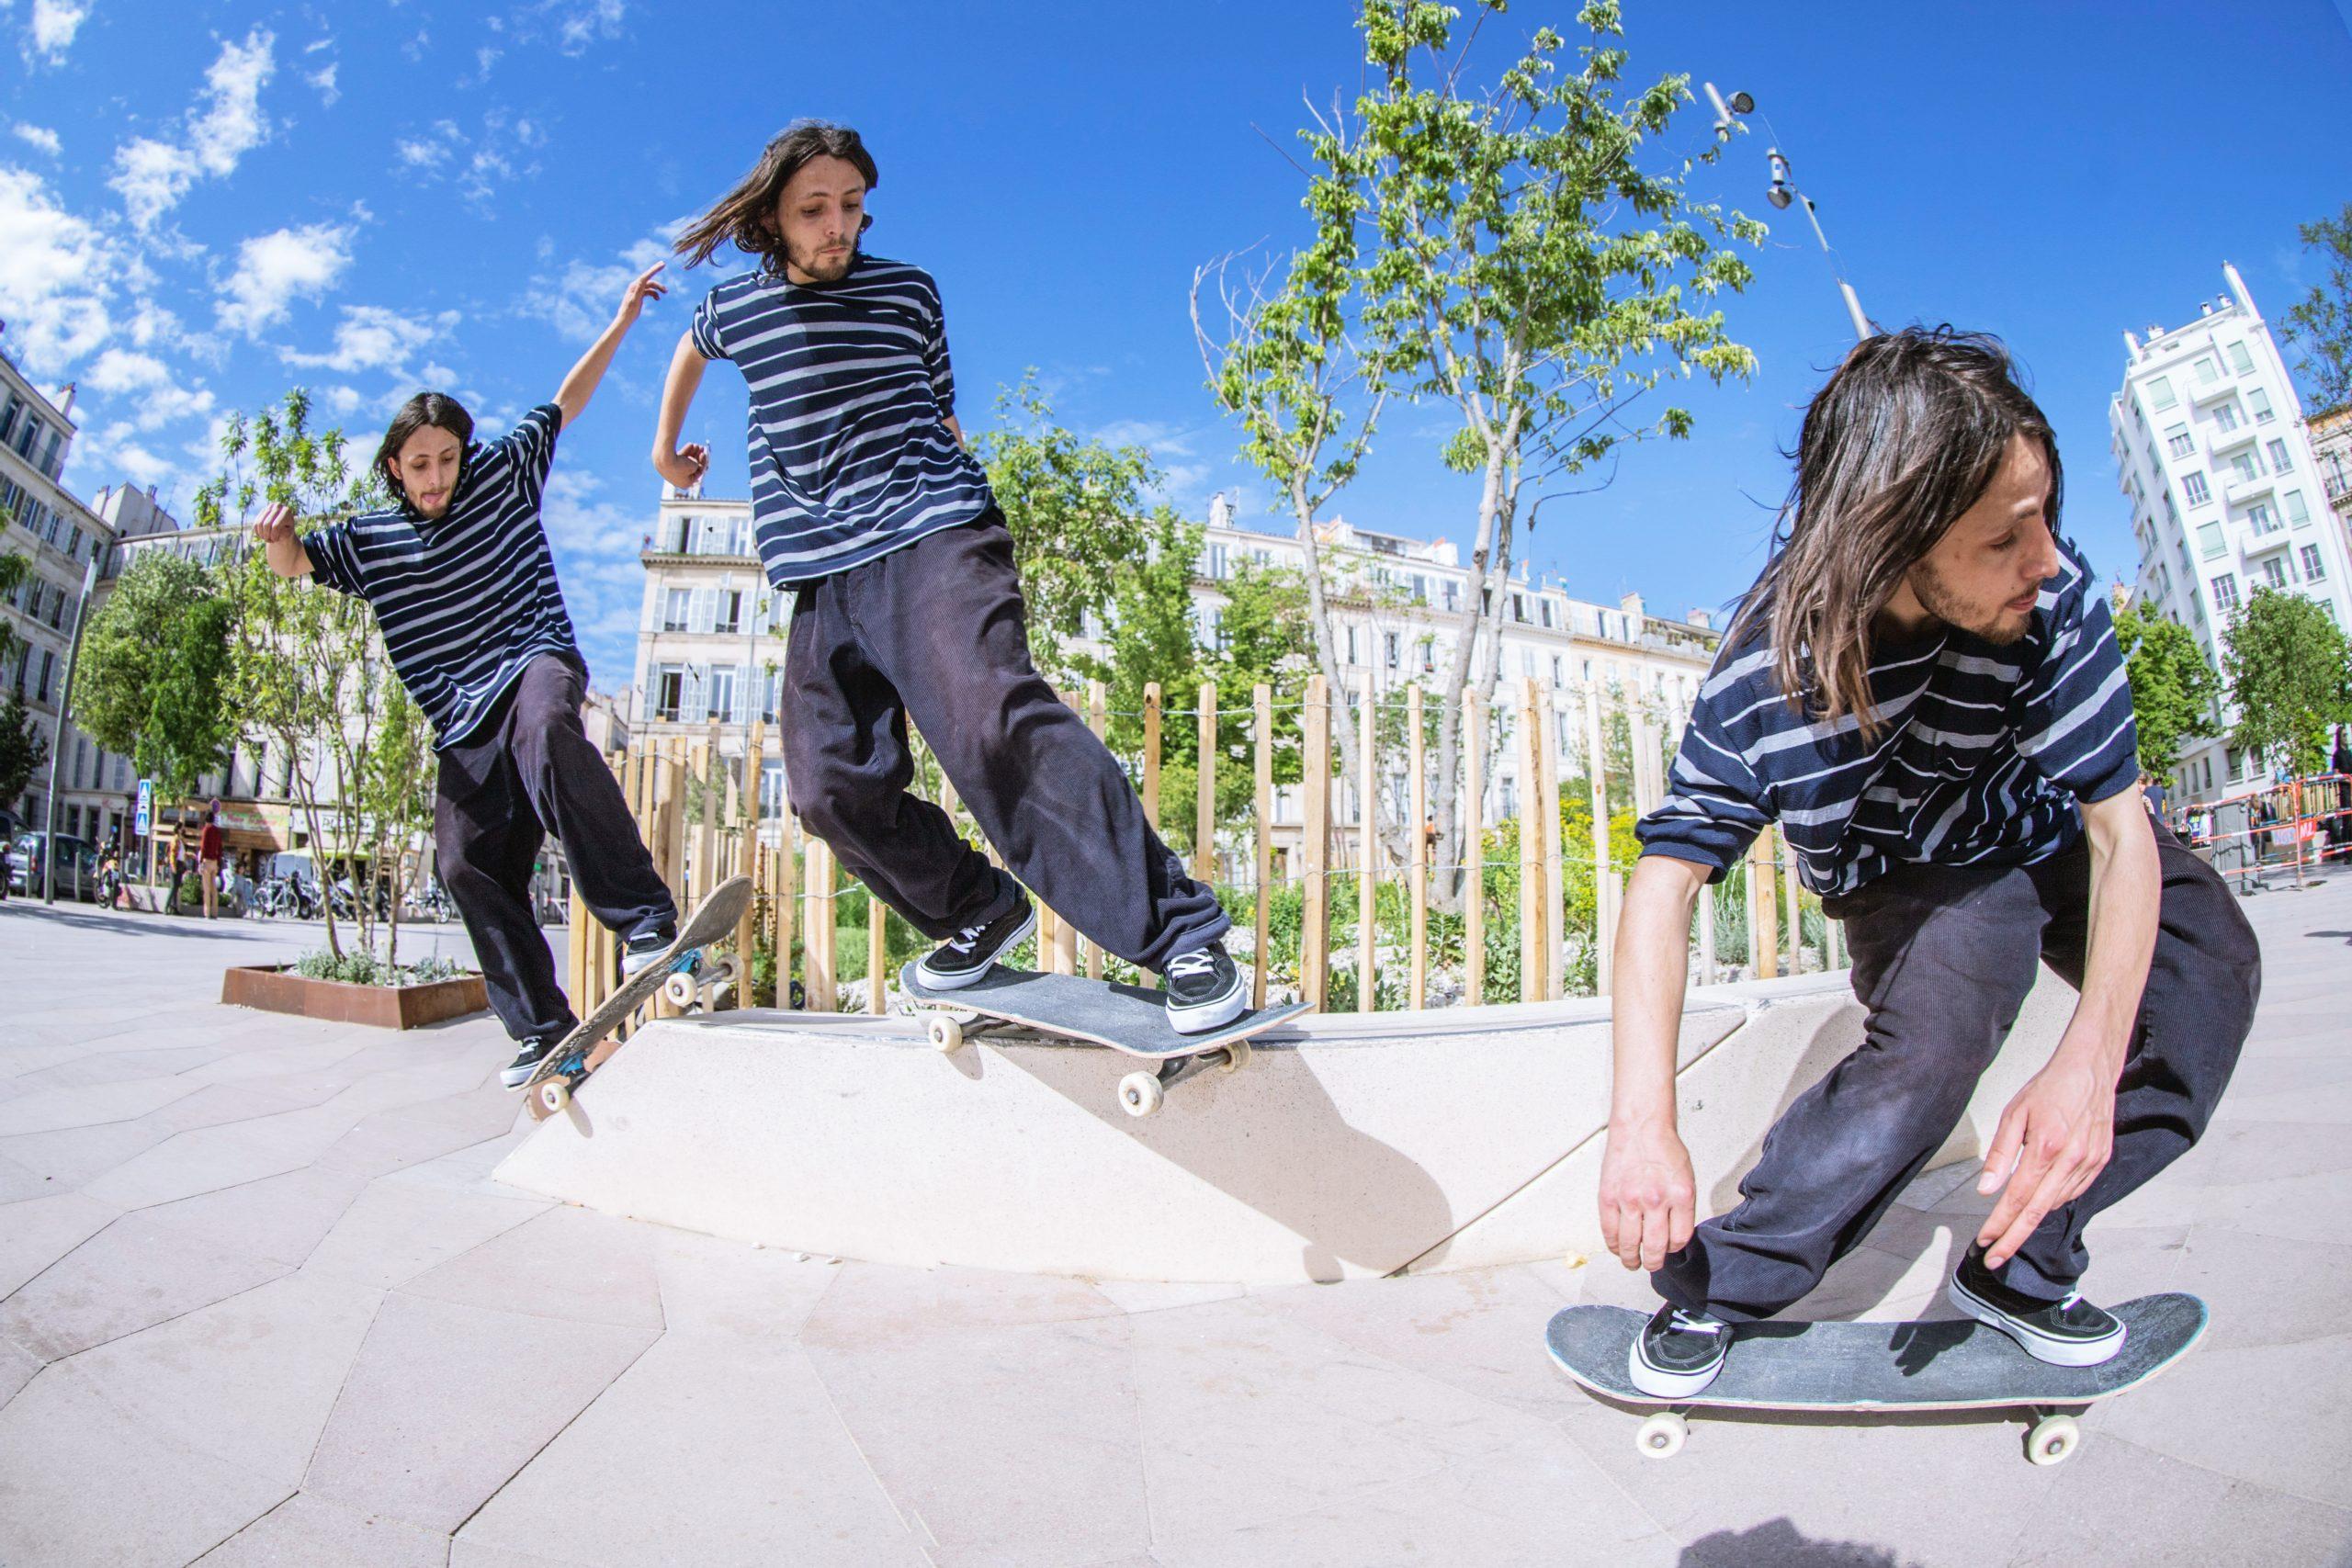 skate-collage-noir-blanc-grind-photographe-professionnel